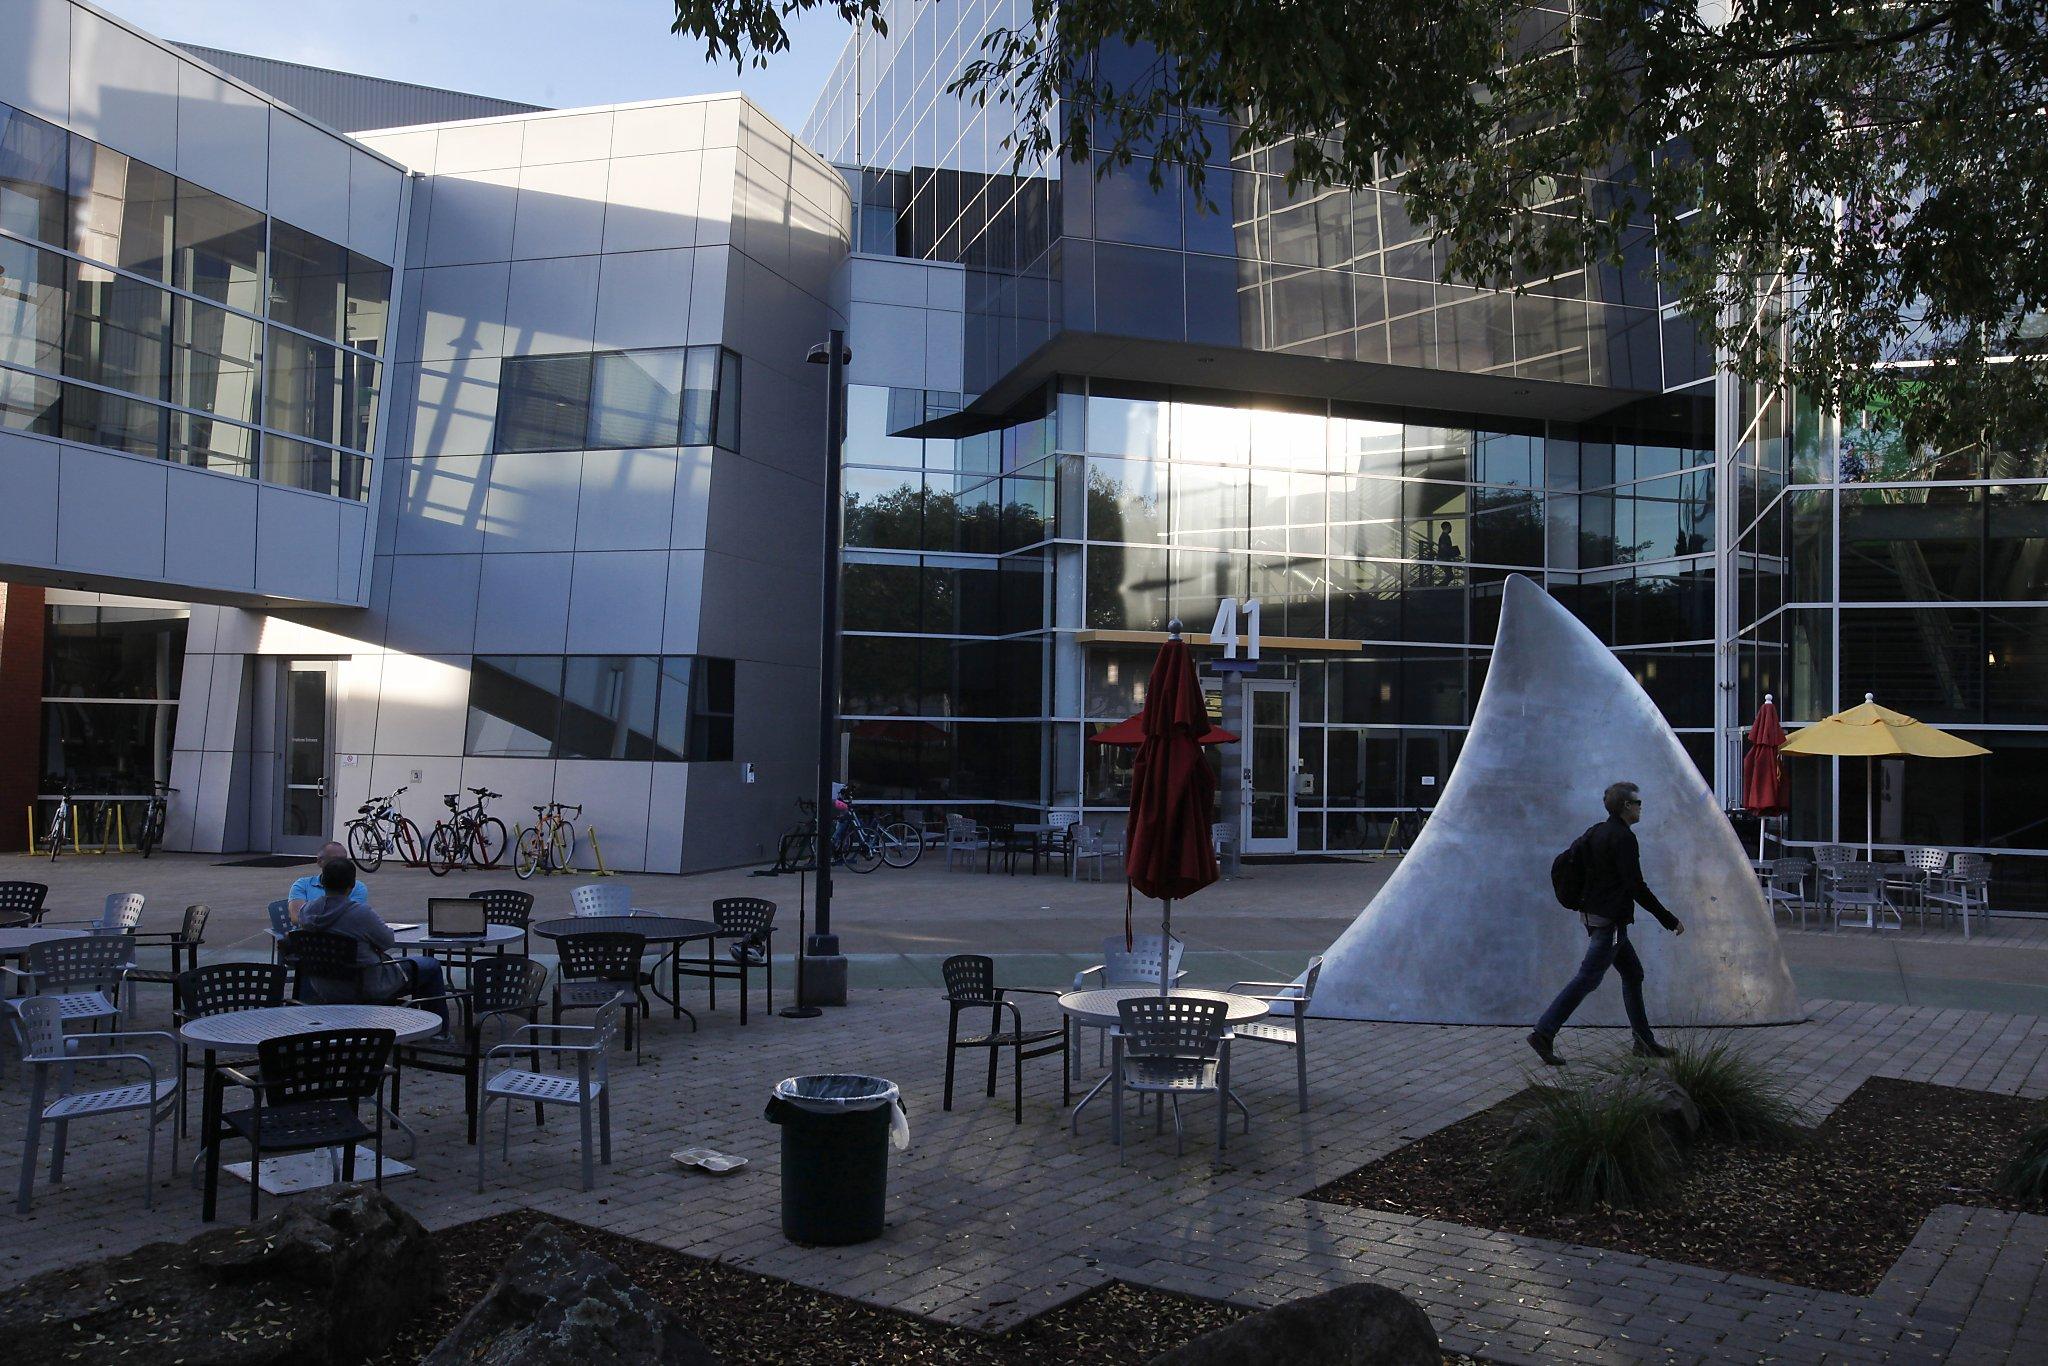 jordan 23 google office. Office Space: Google\u0027s Campus Feels As Big The Internet Itself - SFGate Jordan 23 Google